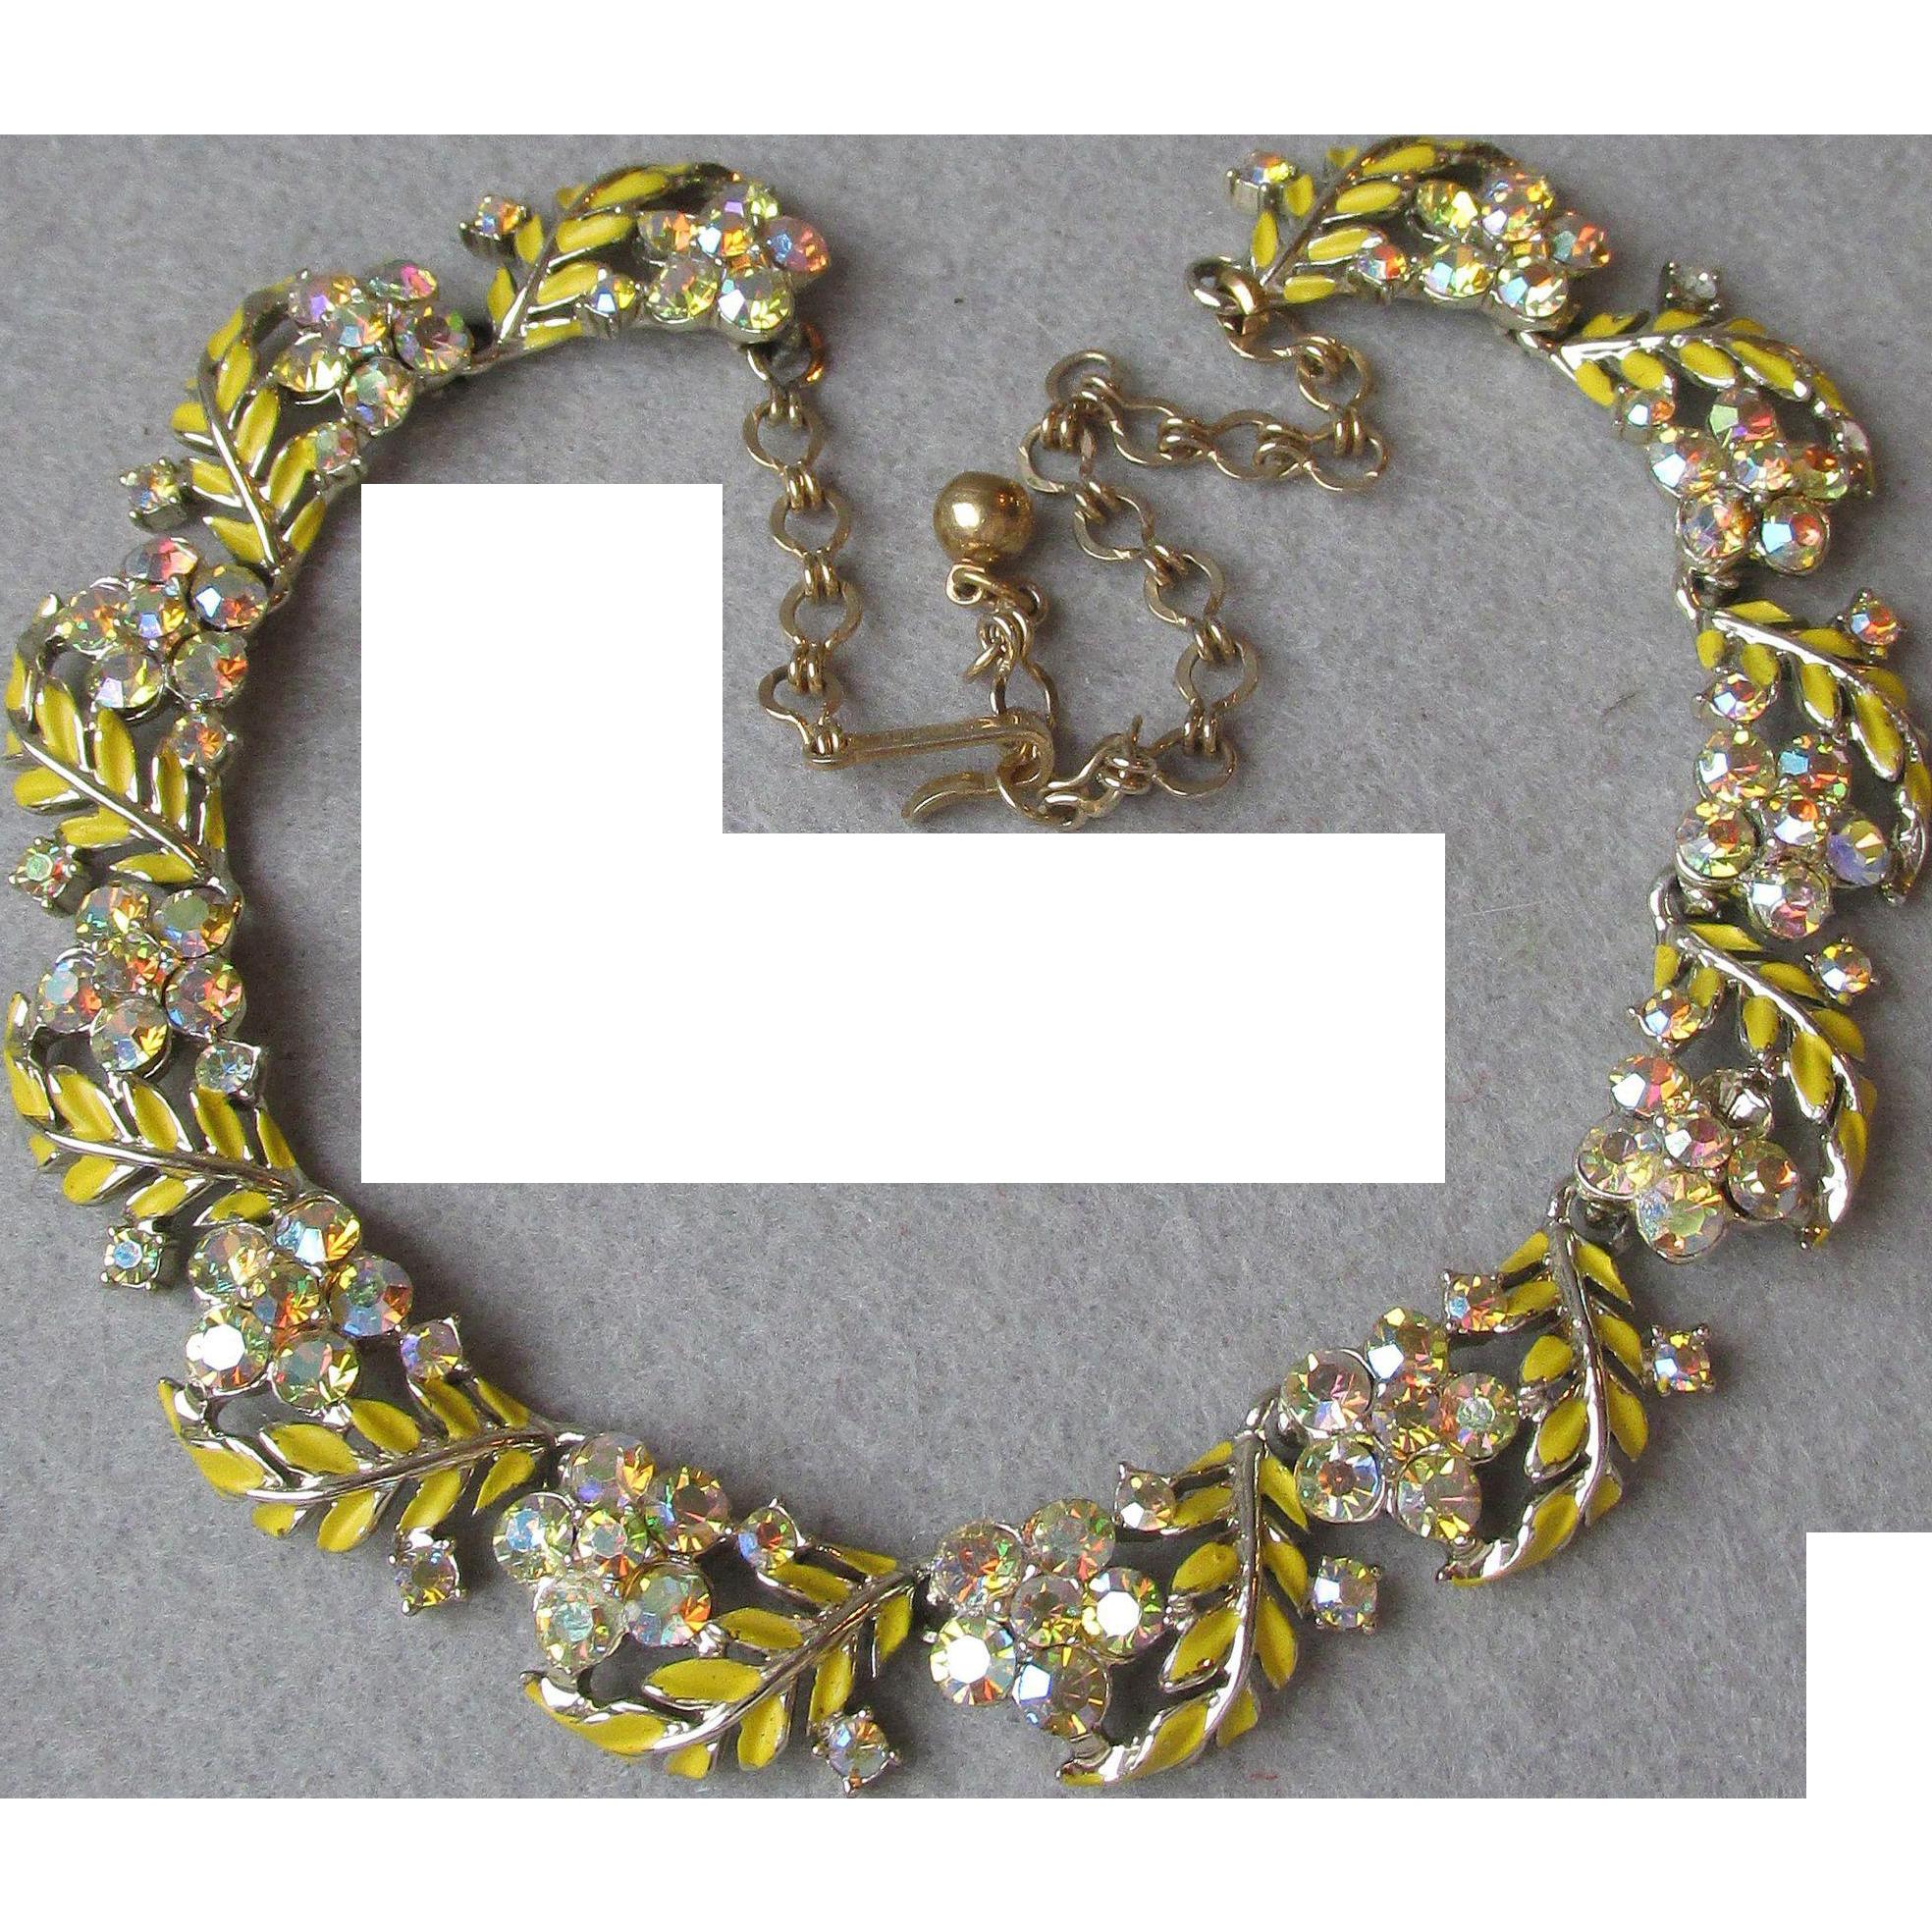 Vintage 1950's Signed CHAREL Yellow Enamel & AB Rhinestone Leaf Flower Link Necklace